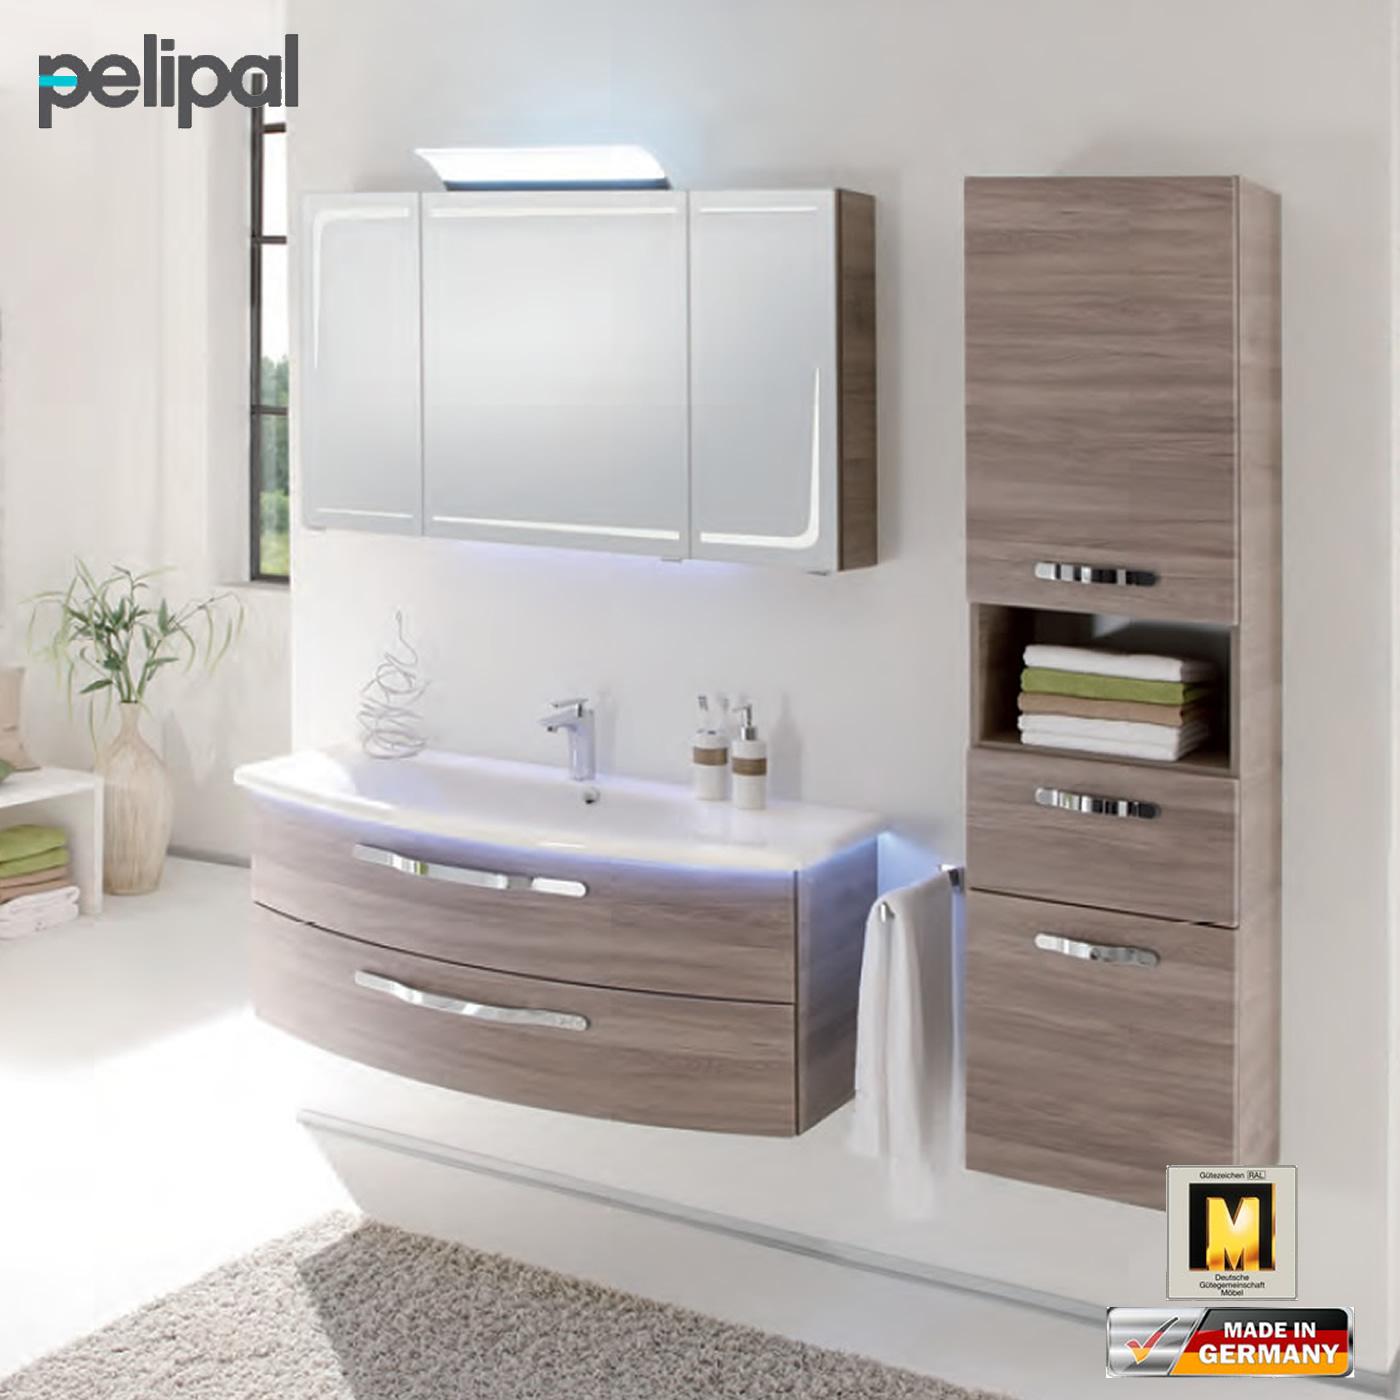 pelipal badm bel als set solitaire 7005 mit spiegelschrank und waschtischset 120 cm pelipal. Black Bedroom Furniture Sets. Home Design Ideas